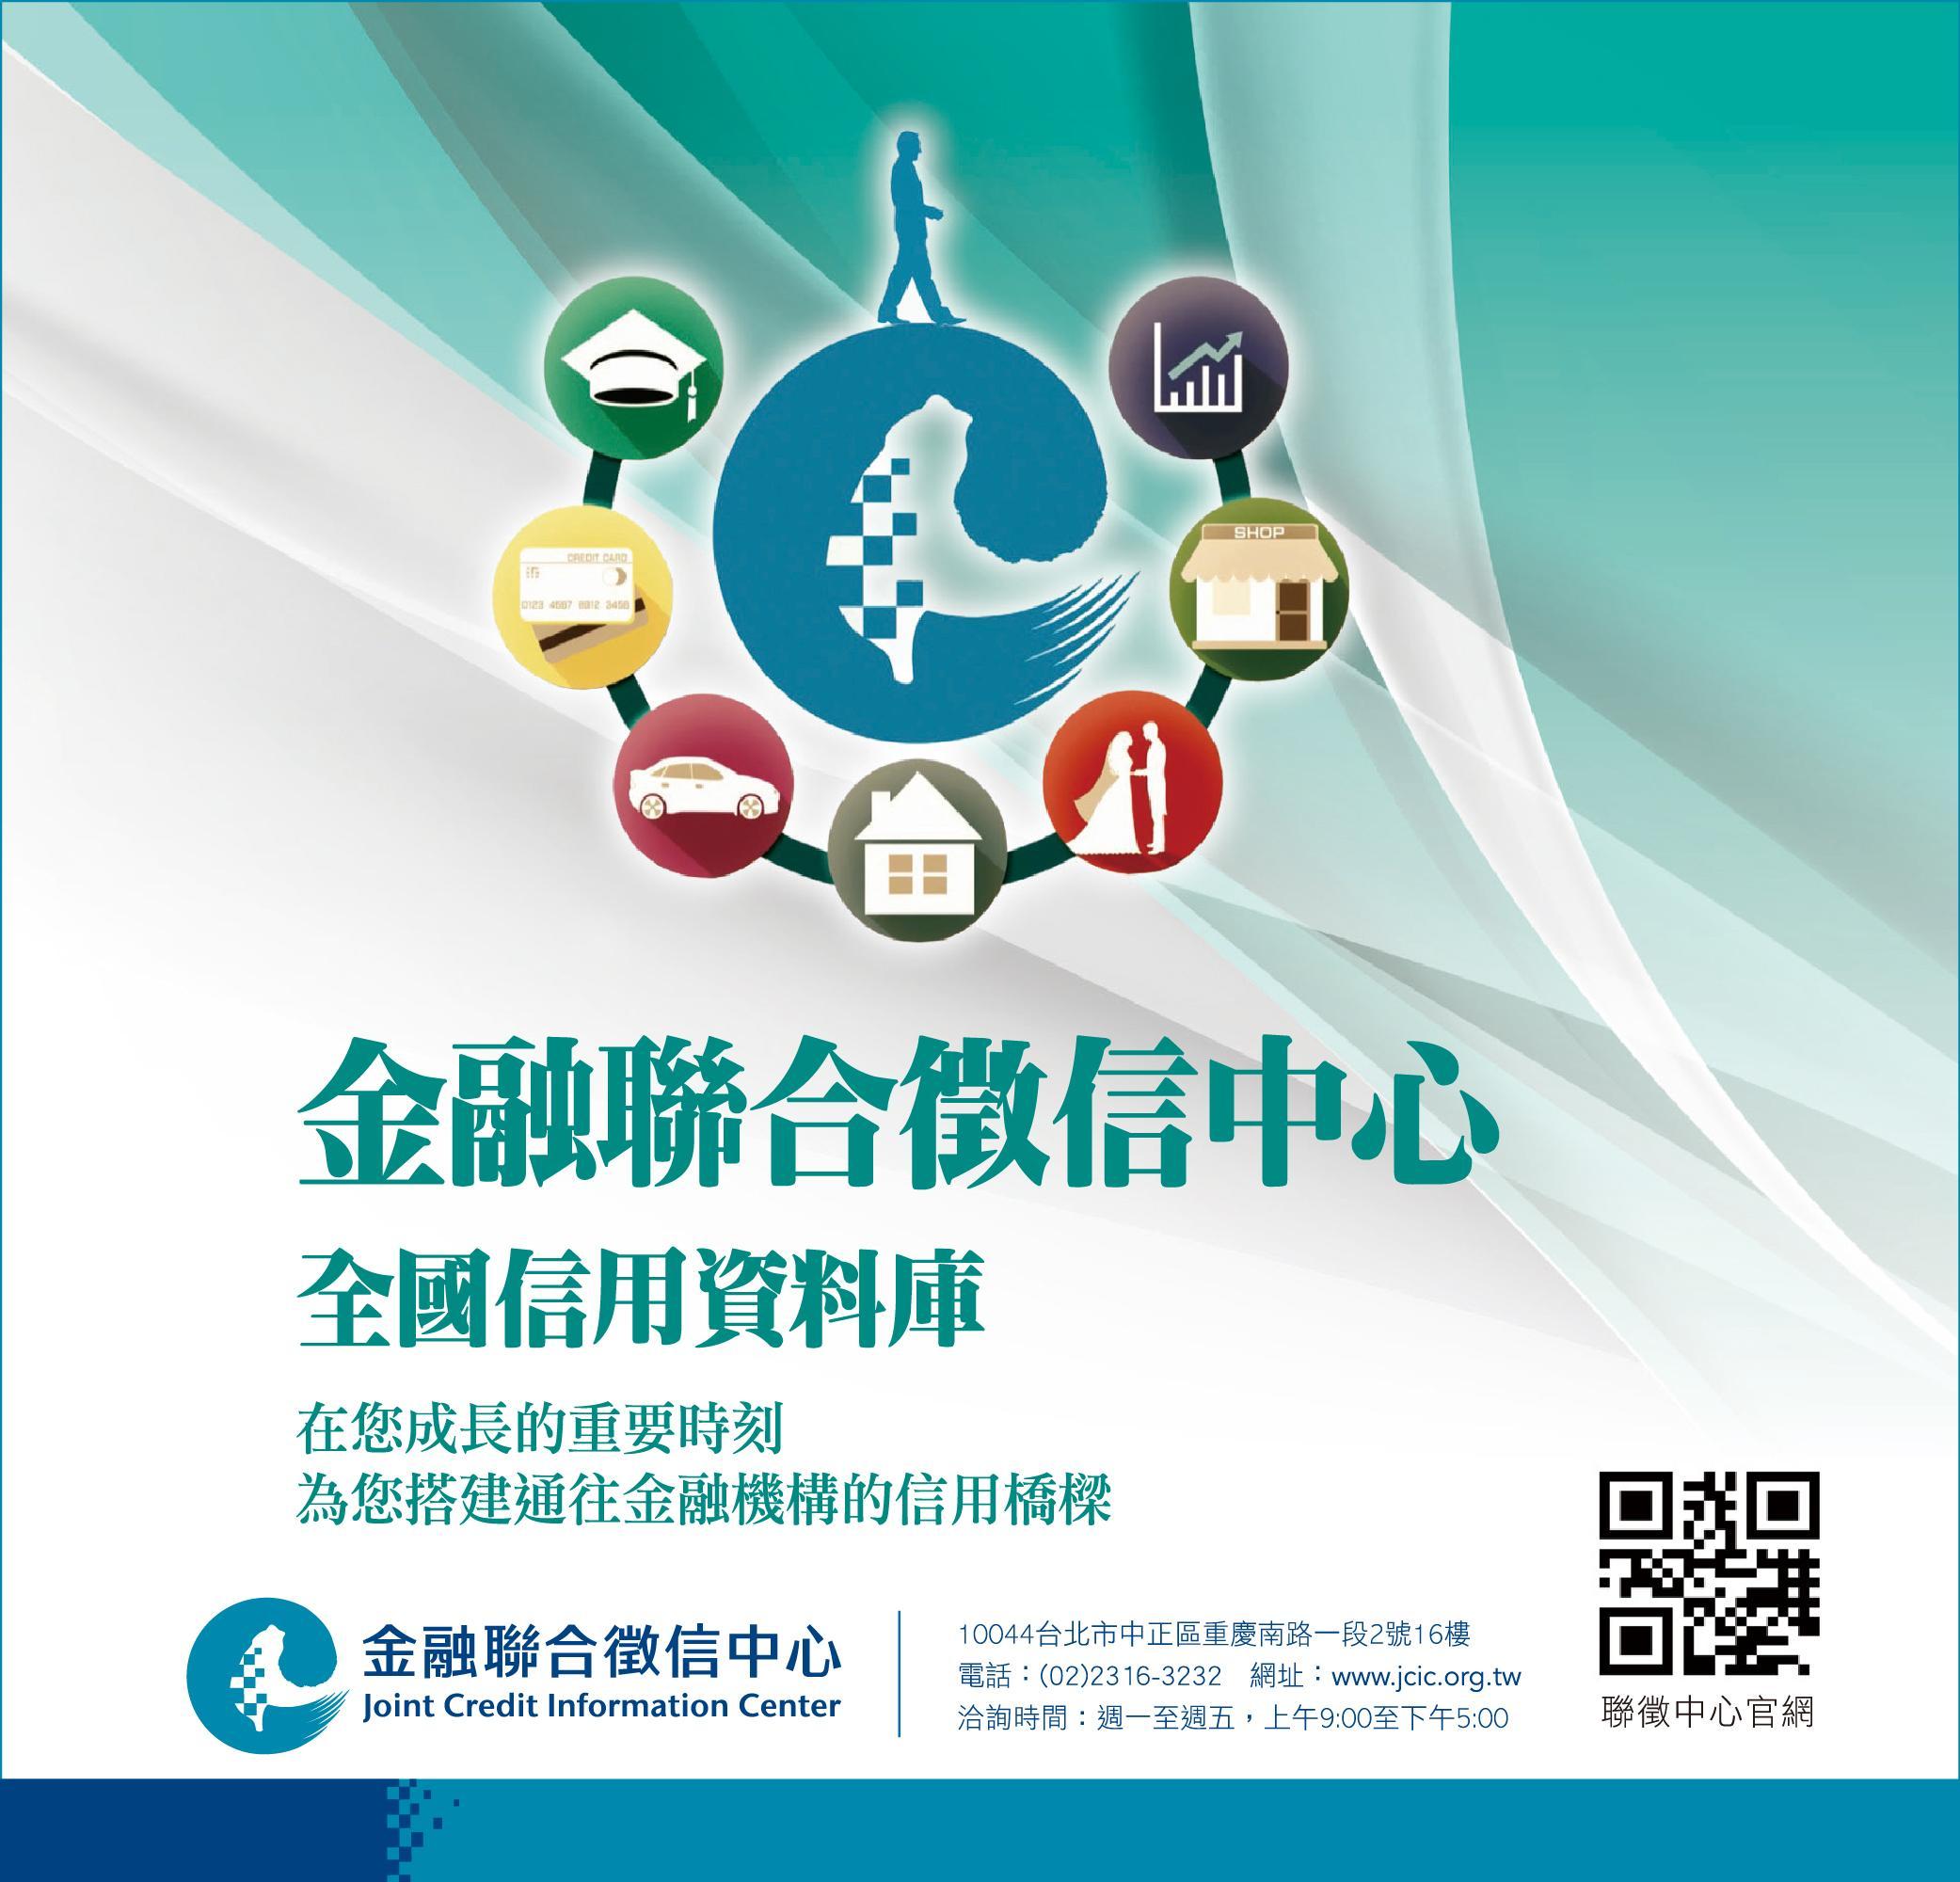 Taiwan News Online - Breaking News, Politics, Environment ...